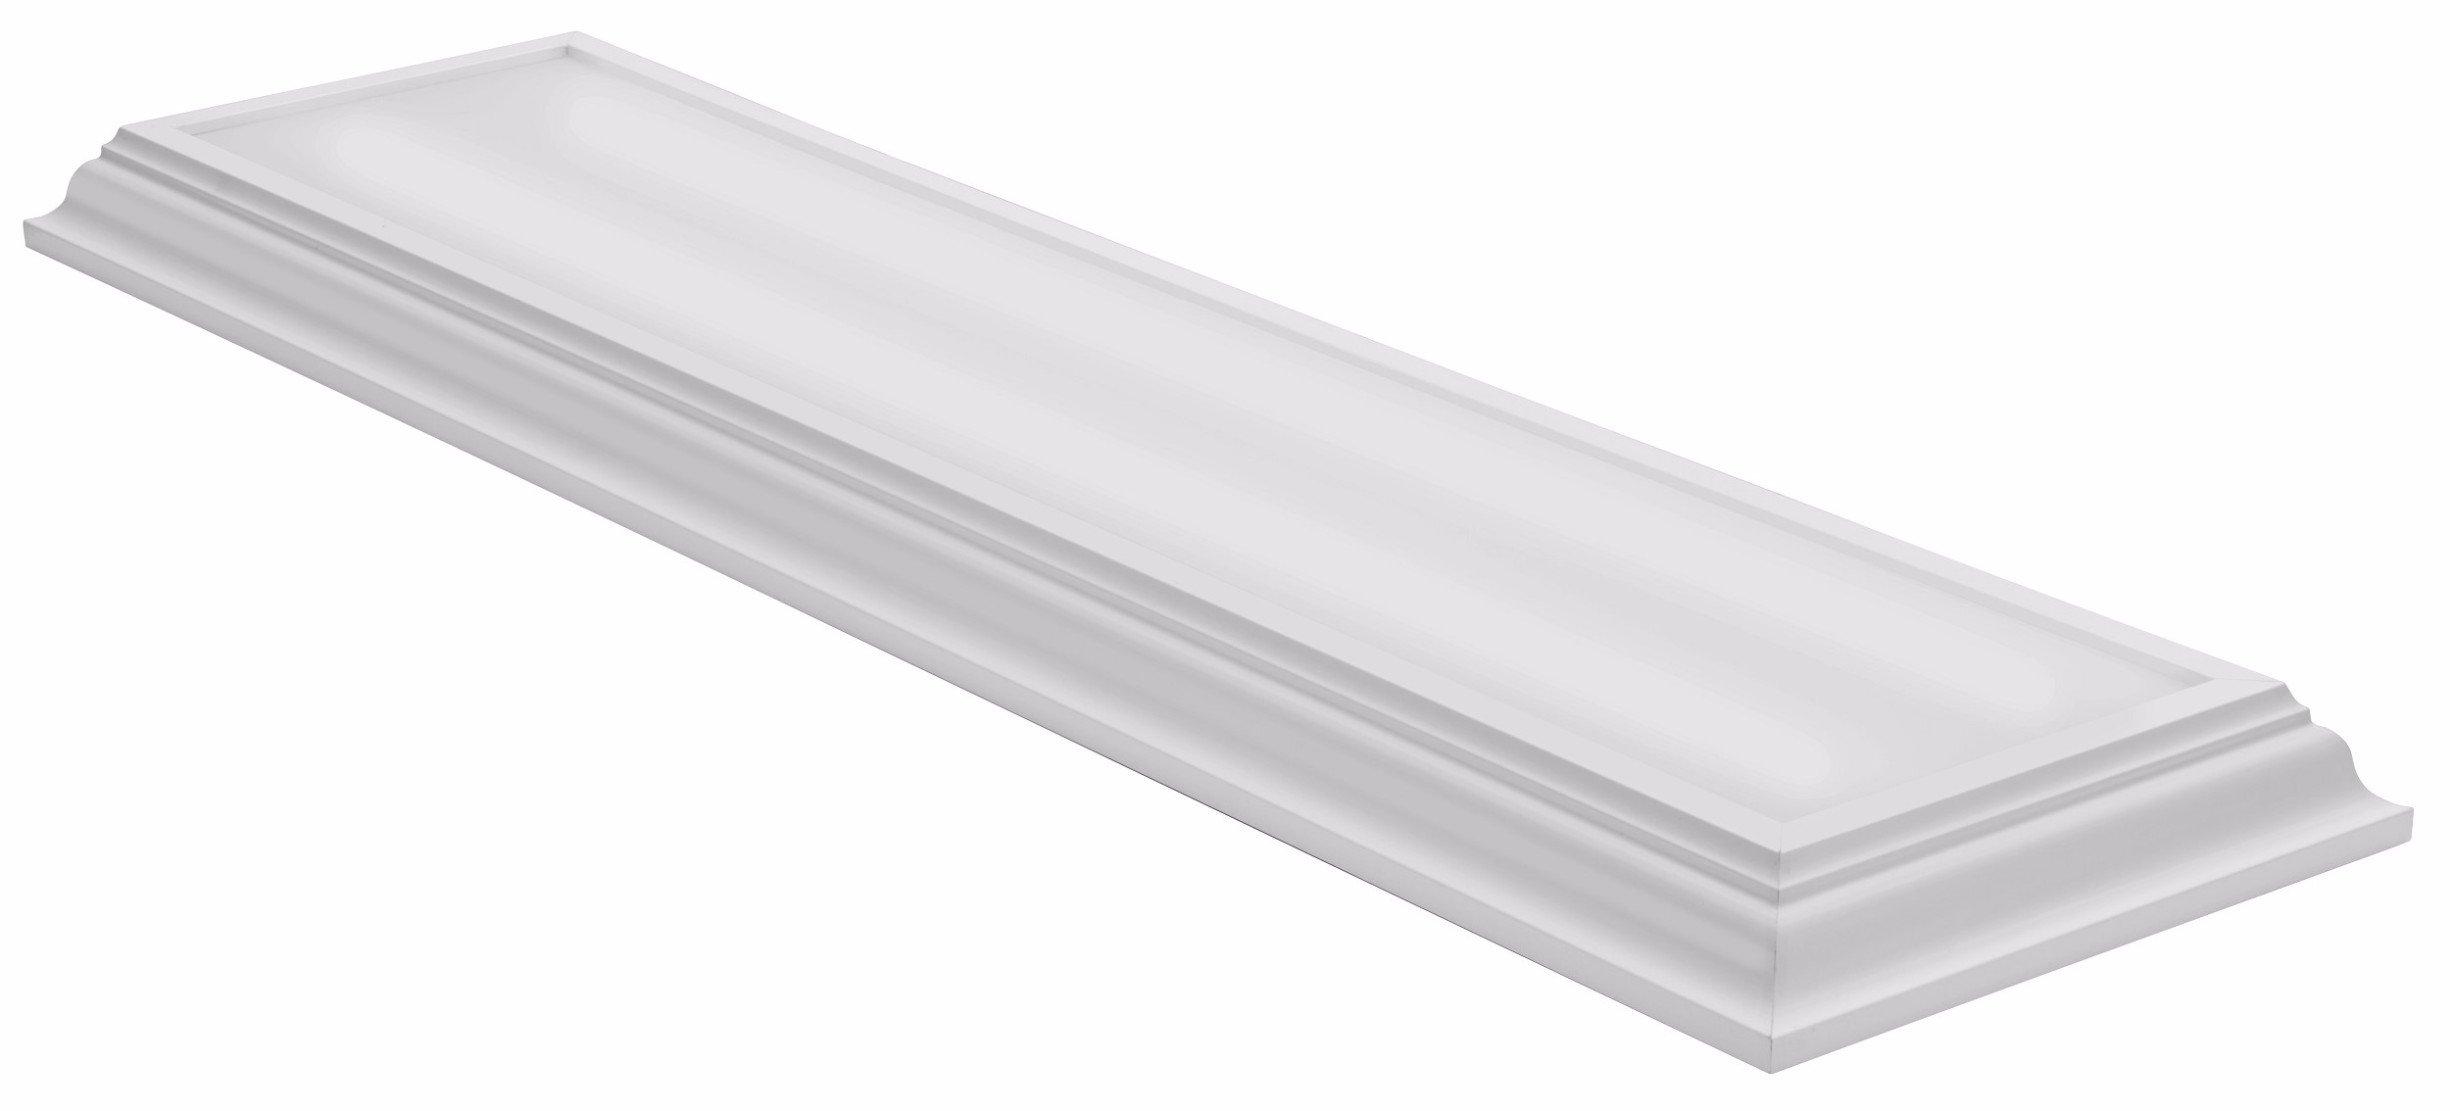 Lithonia Lighting White 4-Ft LED Flush Mount, 4000K, 35.5W, 2,800 Lumens by Lithonia Lighting